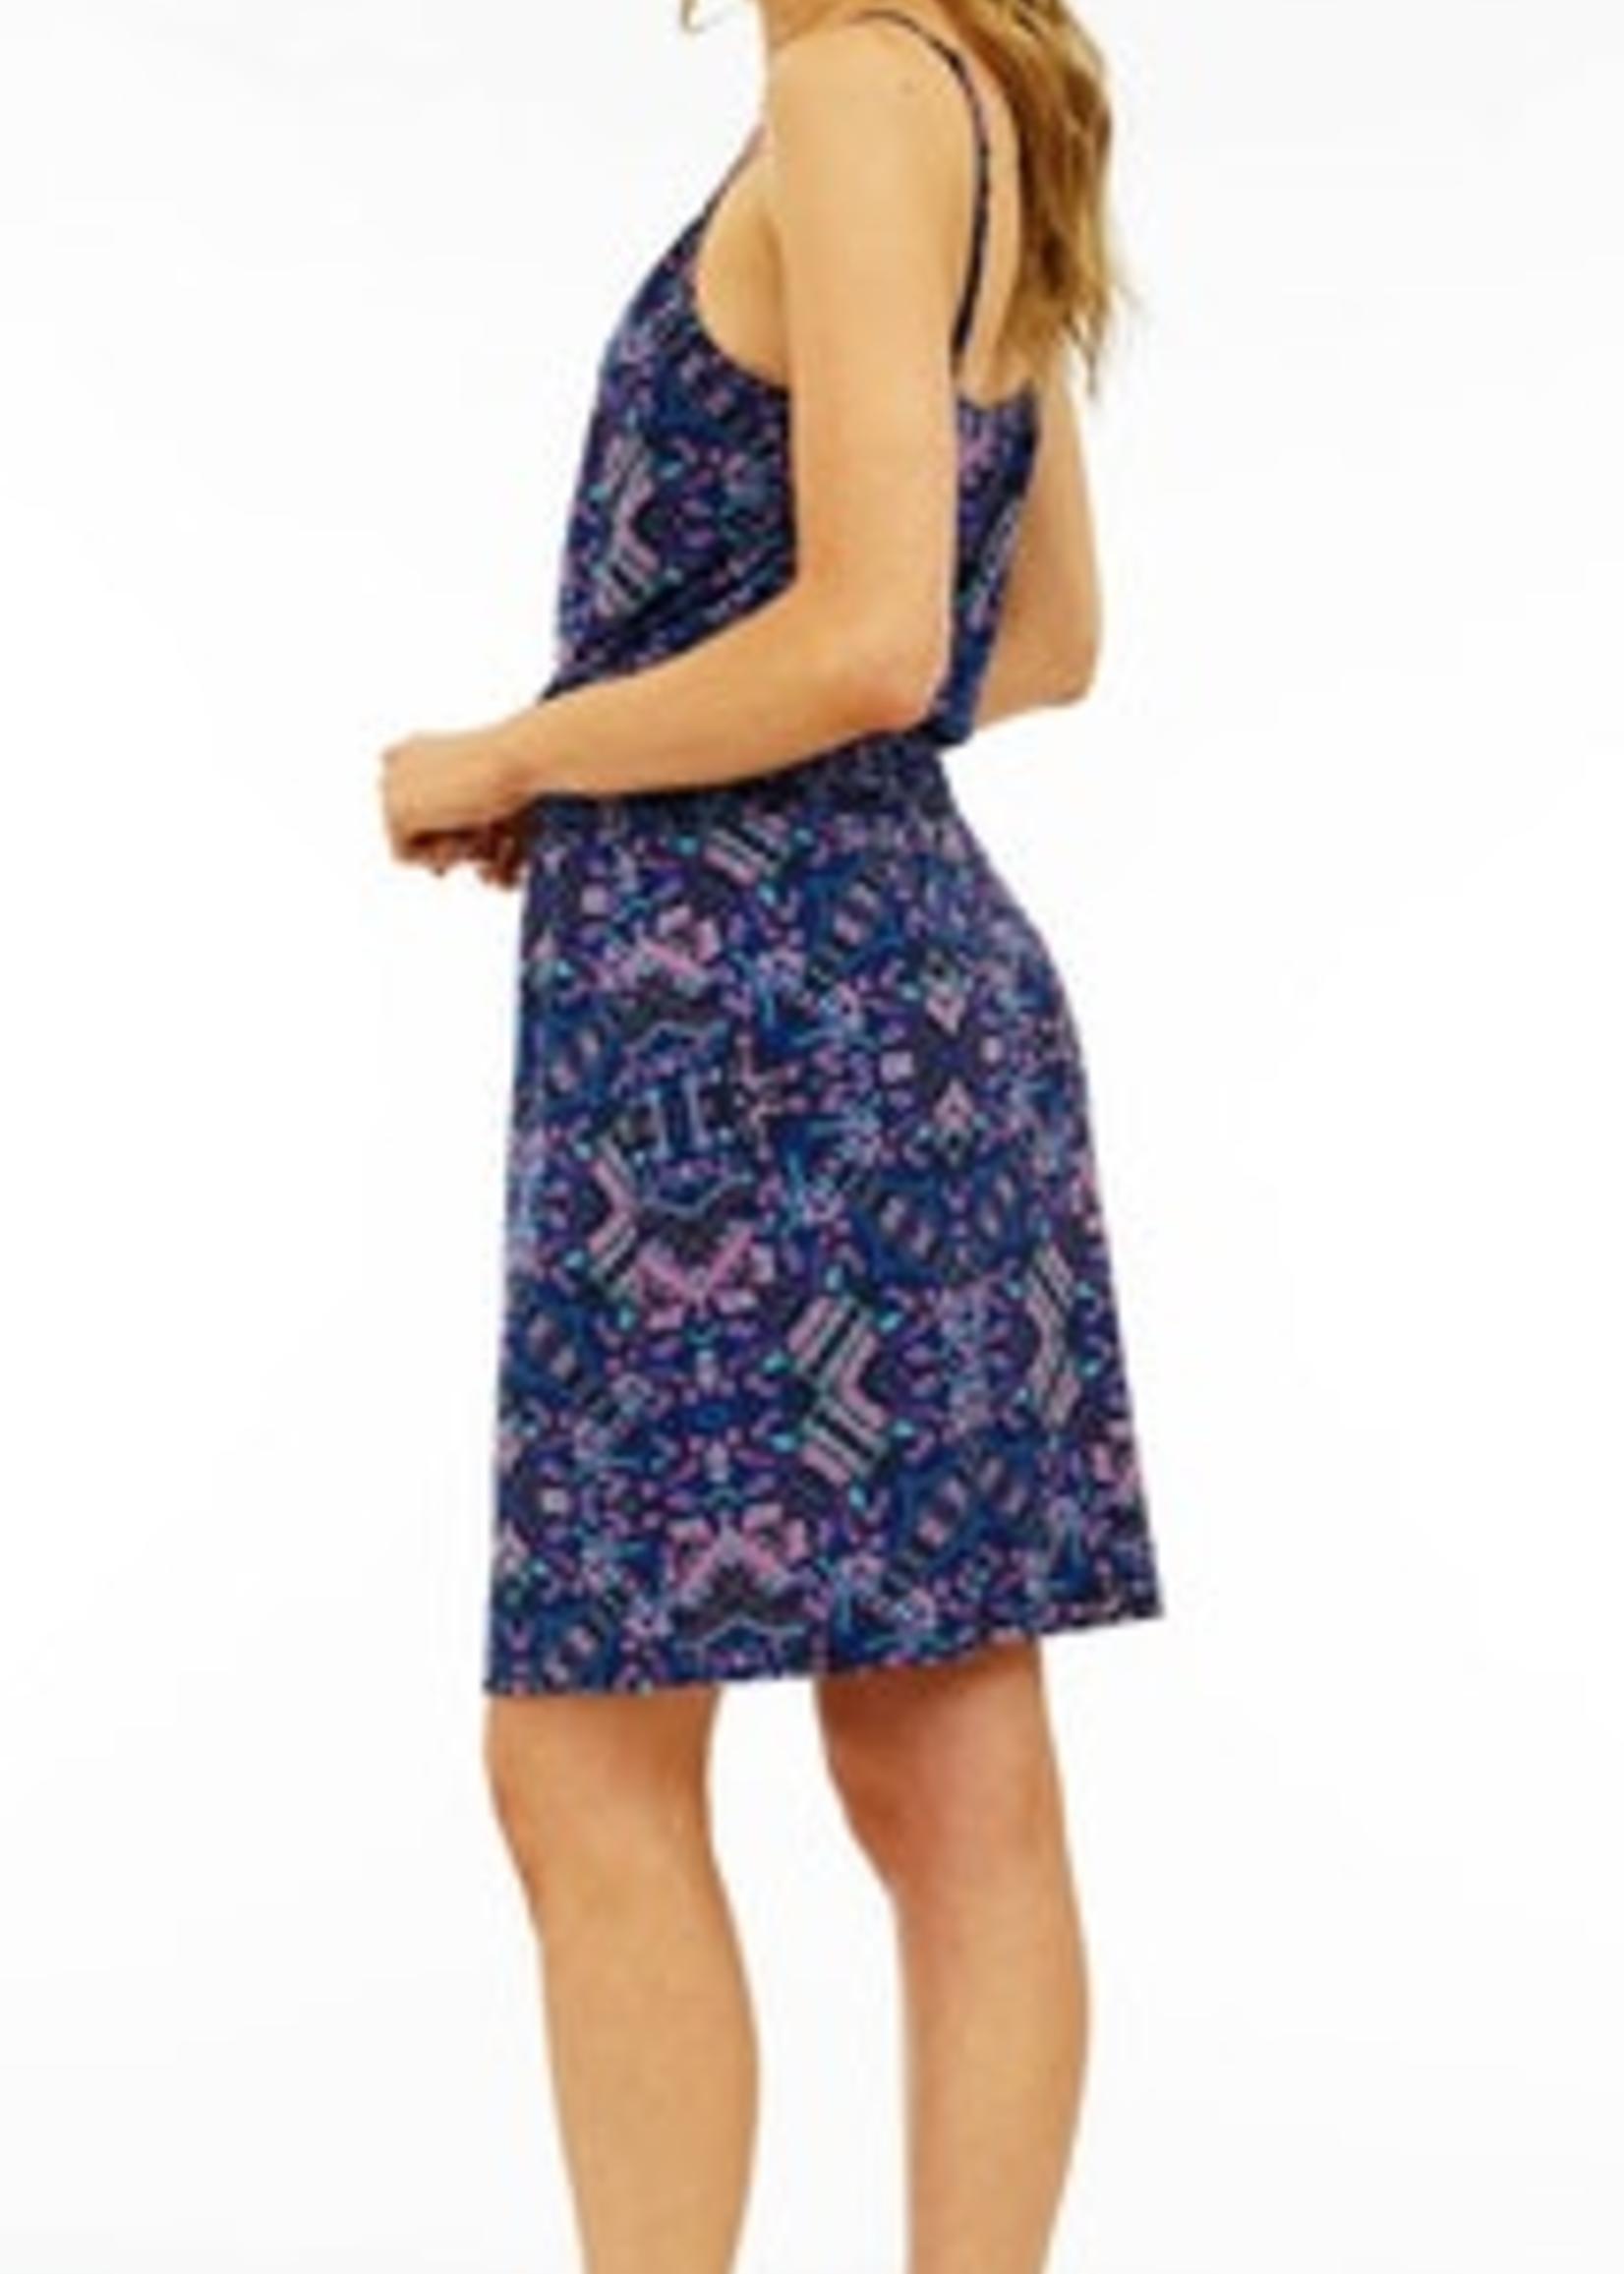 Veronica M Katrina Dress